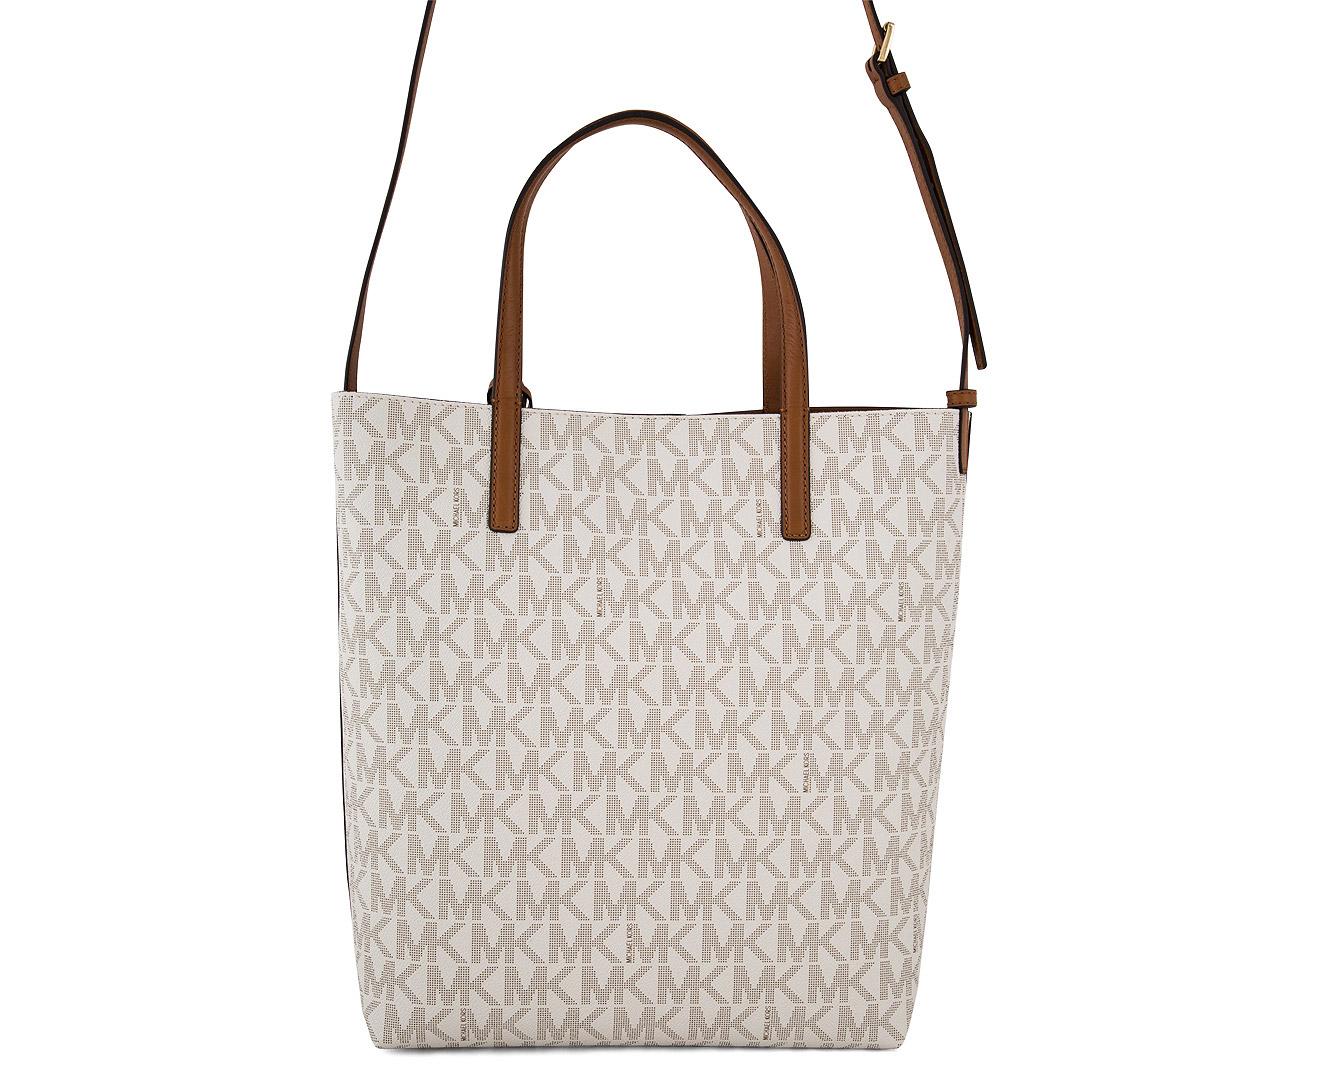 0e9af0833ab6 Michael Kors Hayley Large Logo North-South Tote Bag - Vanilla Acorn ...